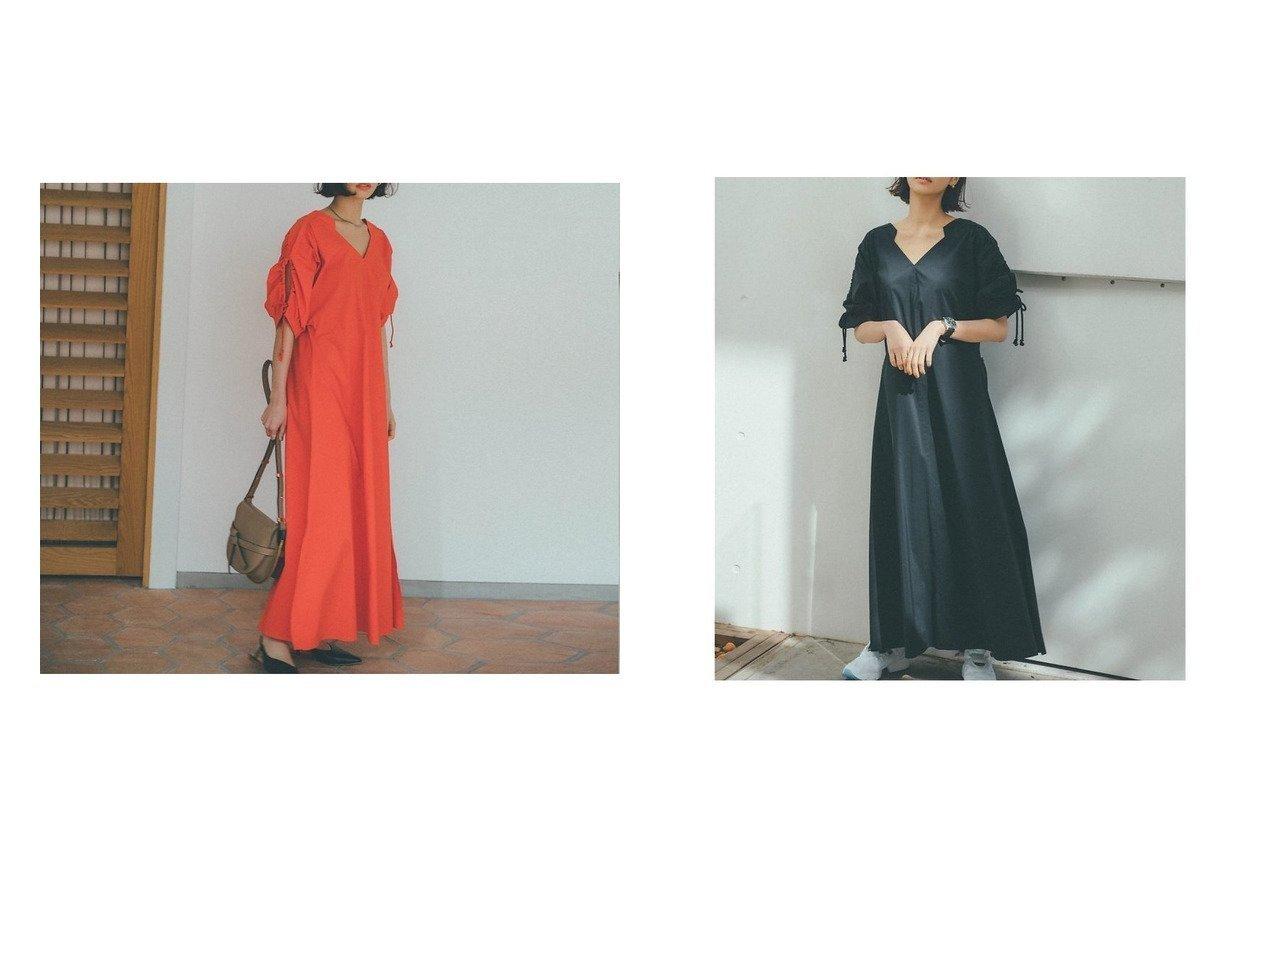 【qualite/カリテ】の【鳳山えりqualite scape】ドロストスリーブワンピース 【ワンピース・ドレス】おすすめ!人気、トレンド・レディースファッションの通販 おすすめで人気の流行・トレンド、ファッションの通販商品 インテリア・家具・メンズファッション・キッズファッション・レディースファッション・服の通販 founy(ファニー) https://founy.com/ ファッション Fashion レディースファッション WOMEN ワンピース Dress シャツワンピース Shirt Dresses カッティング ギャザー スクエア スリット スリーブ 雑誌 ツイスト デコルテ フィット フレア マキシ リゾート ロング 夏 Summer |ID:crp329100000047644